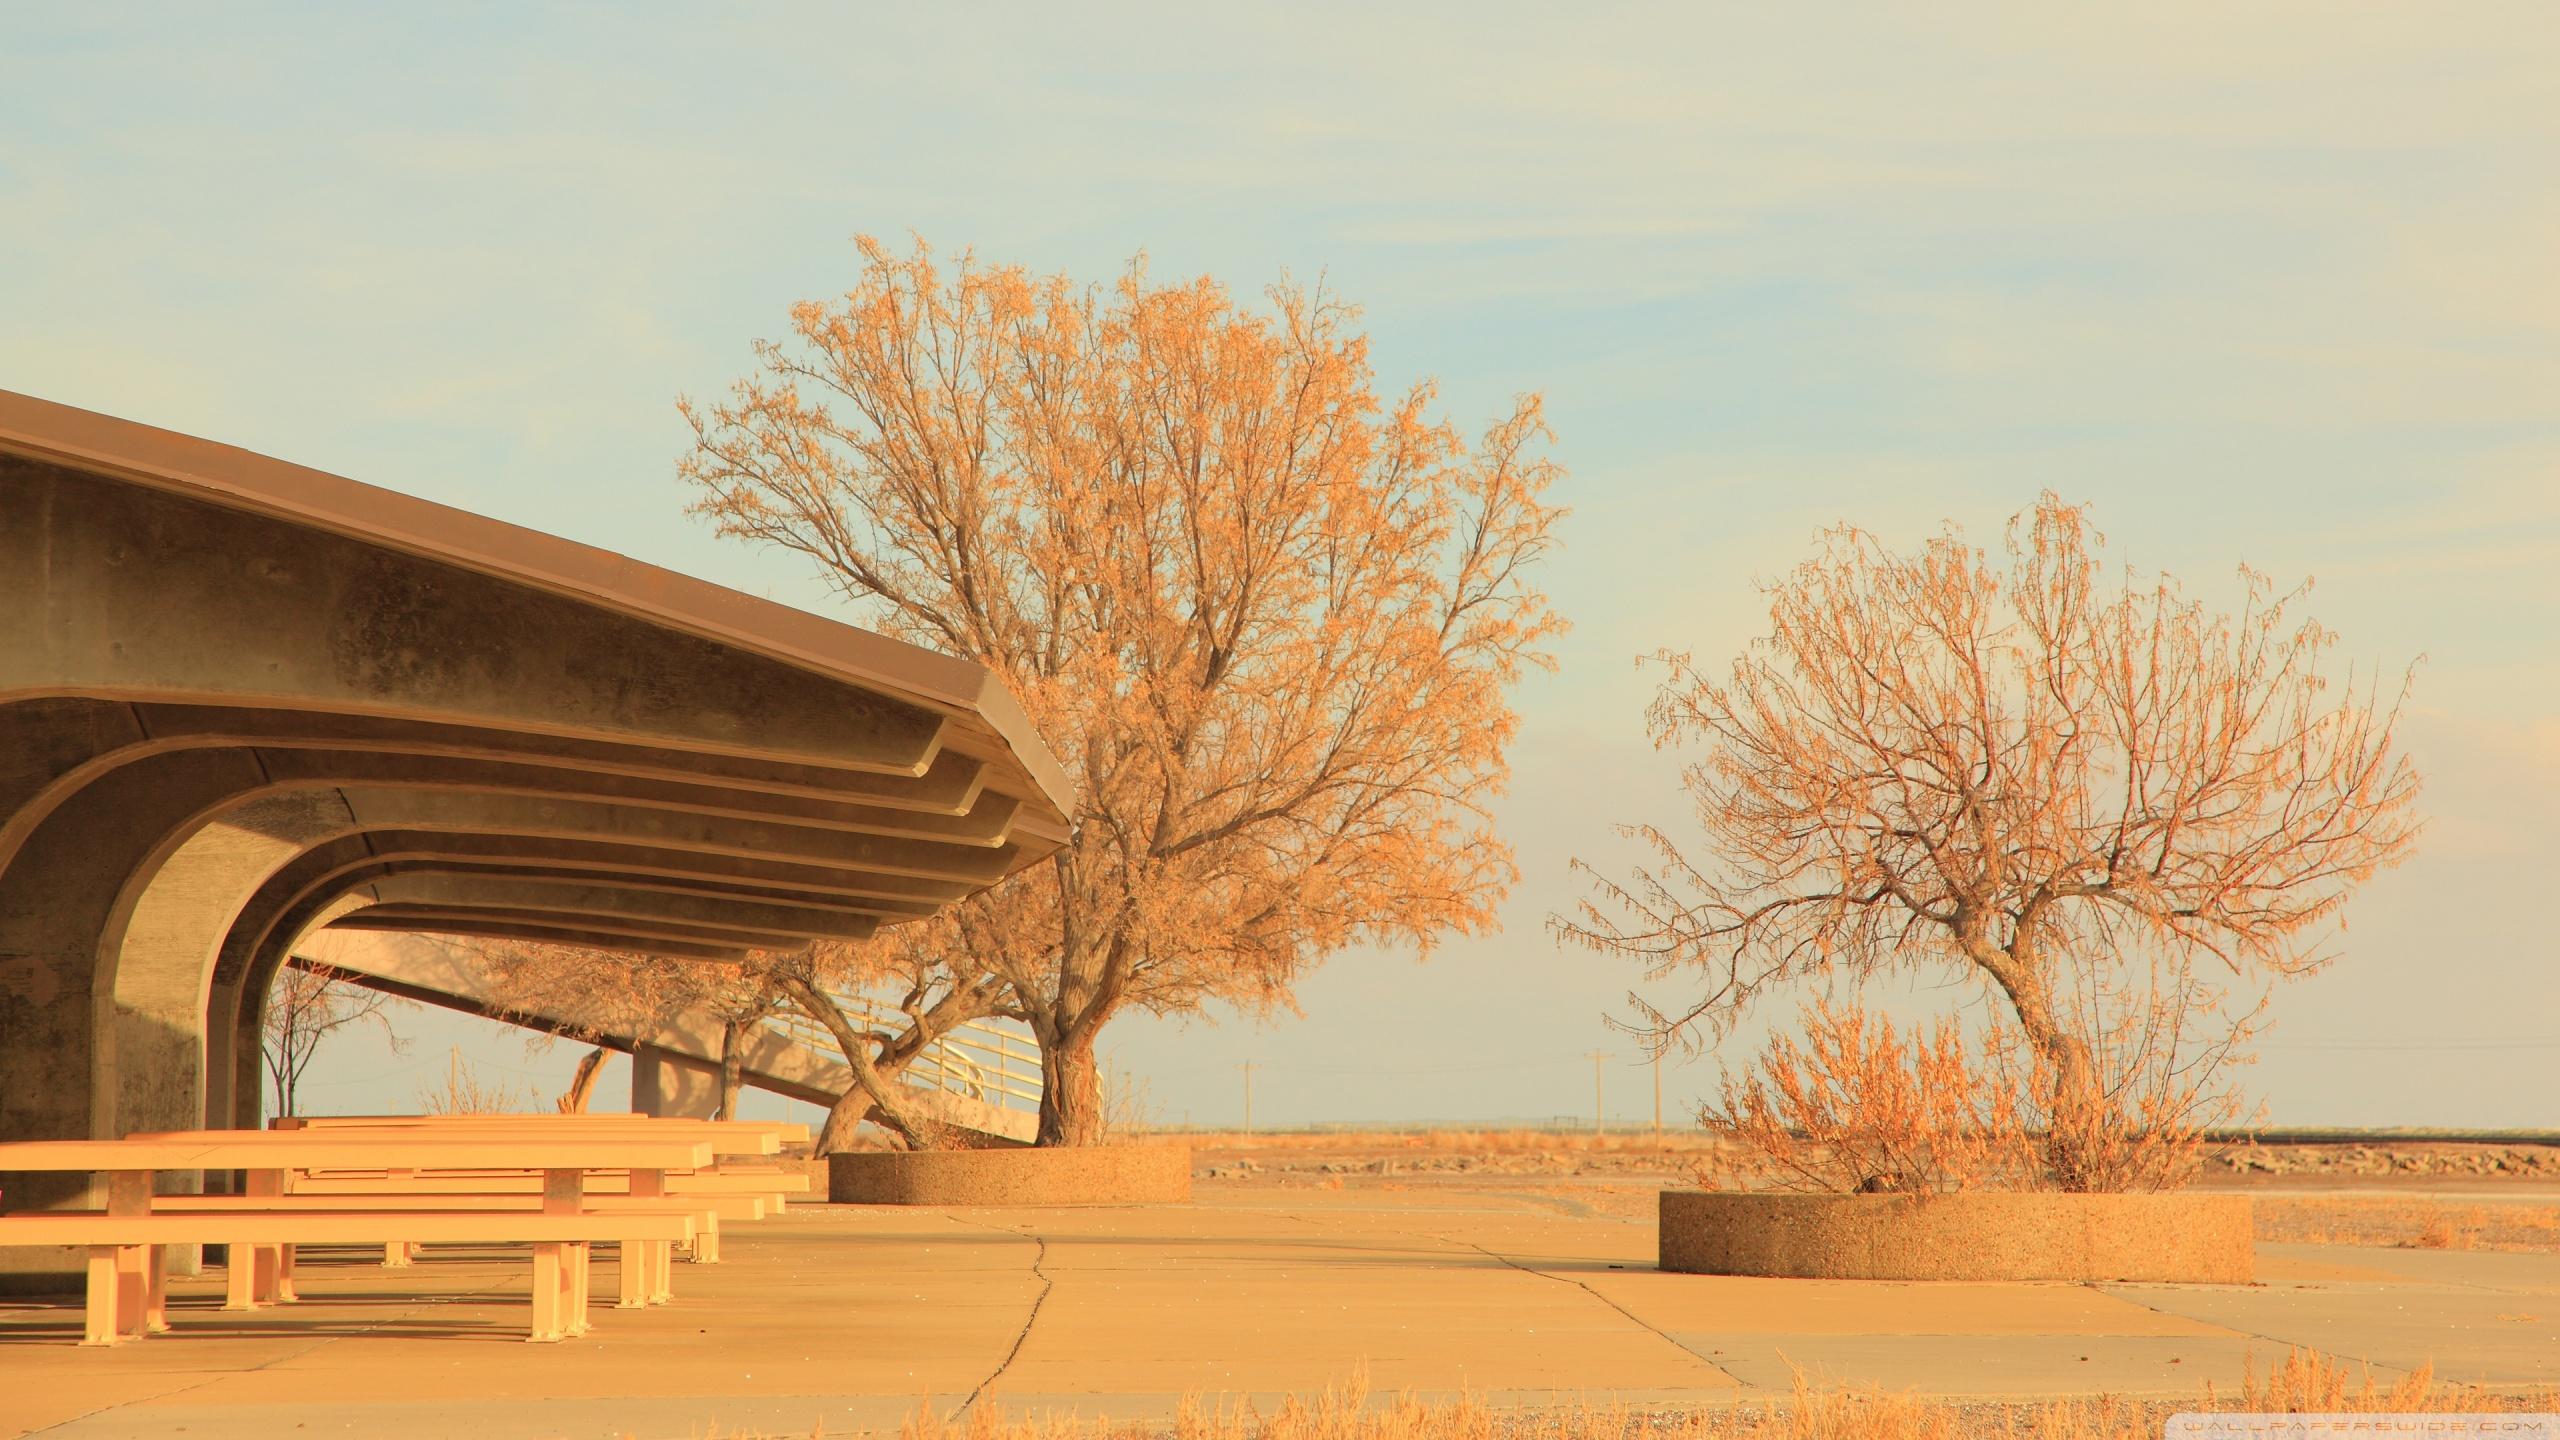 Bonneville Salt Flats Rest Area Utah 4K HD Desktop Wallpaper 2560x1440